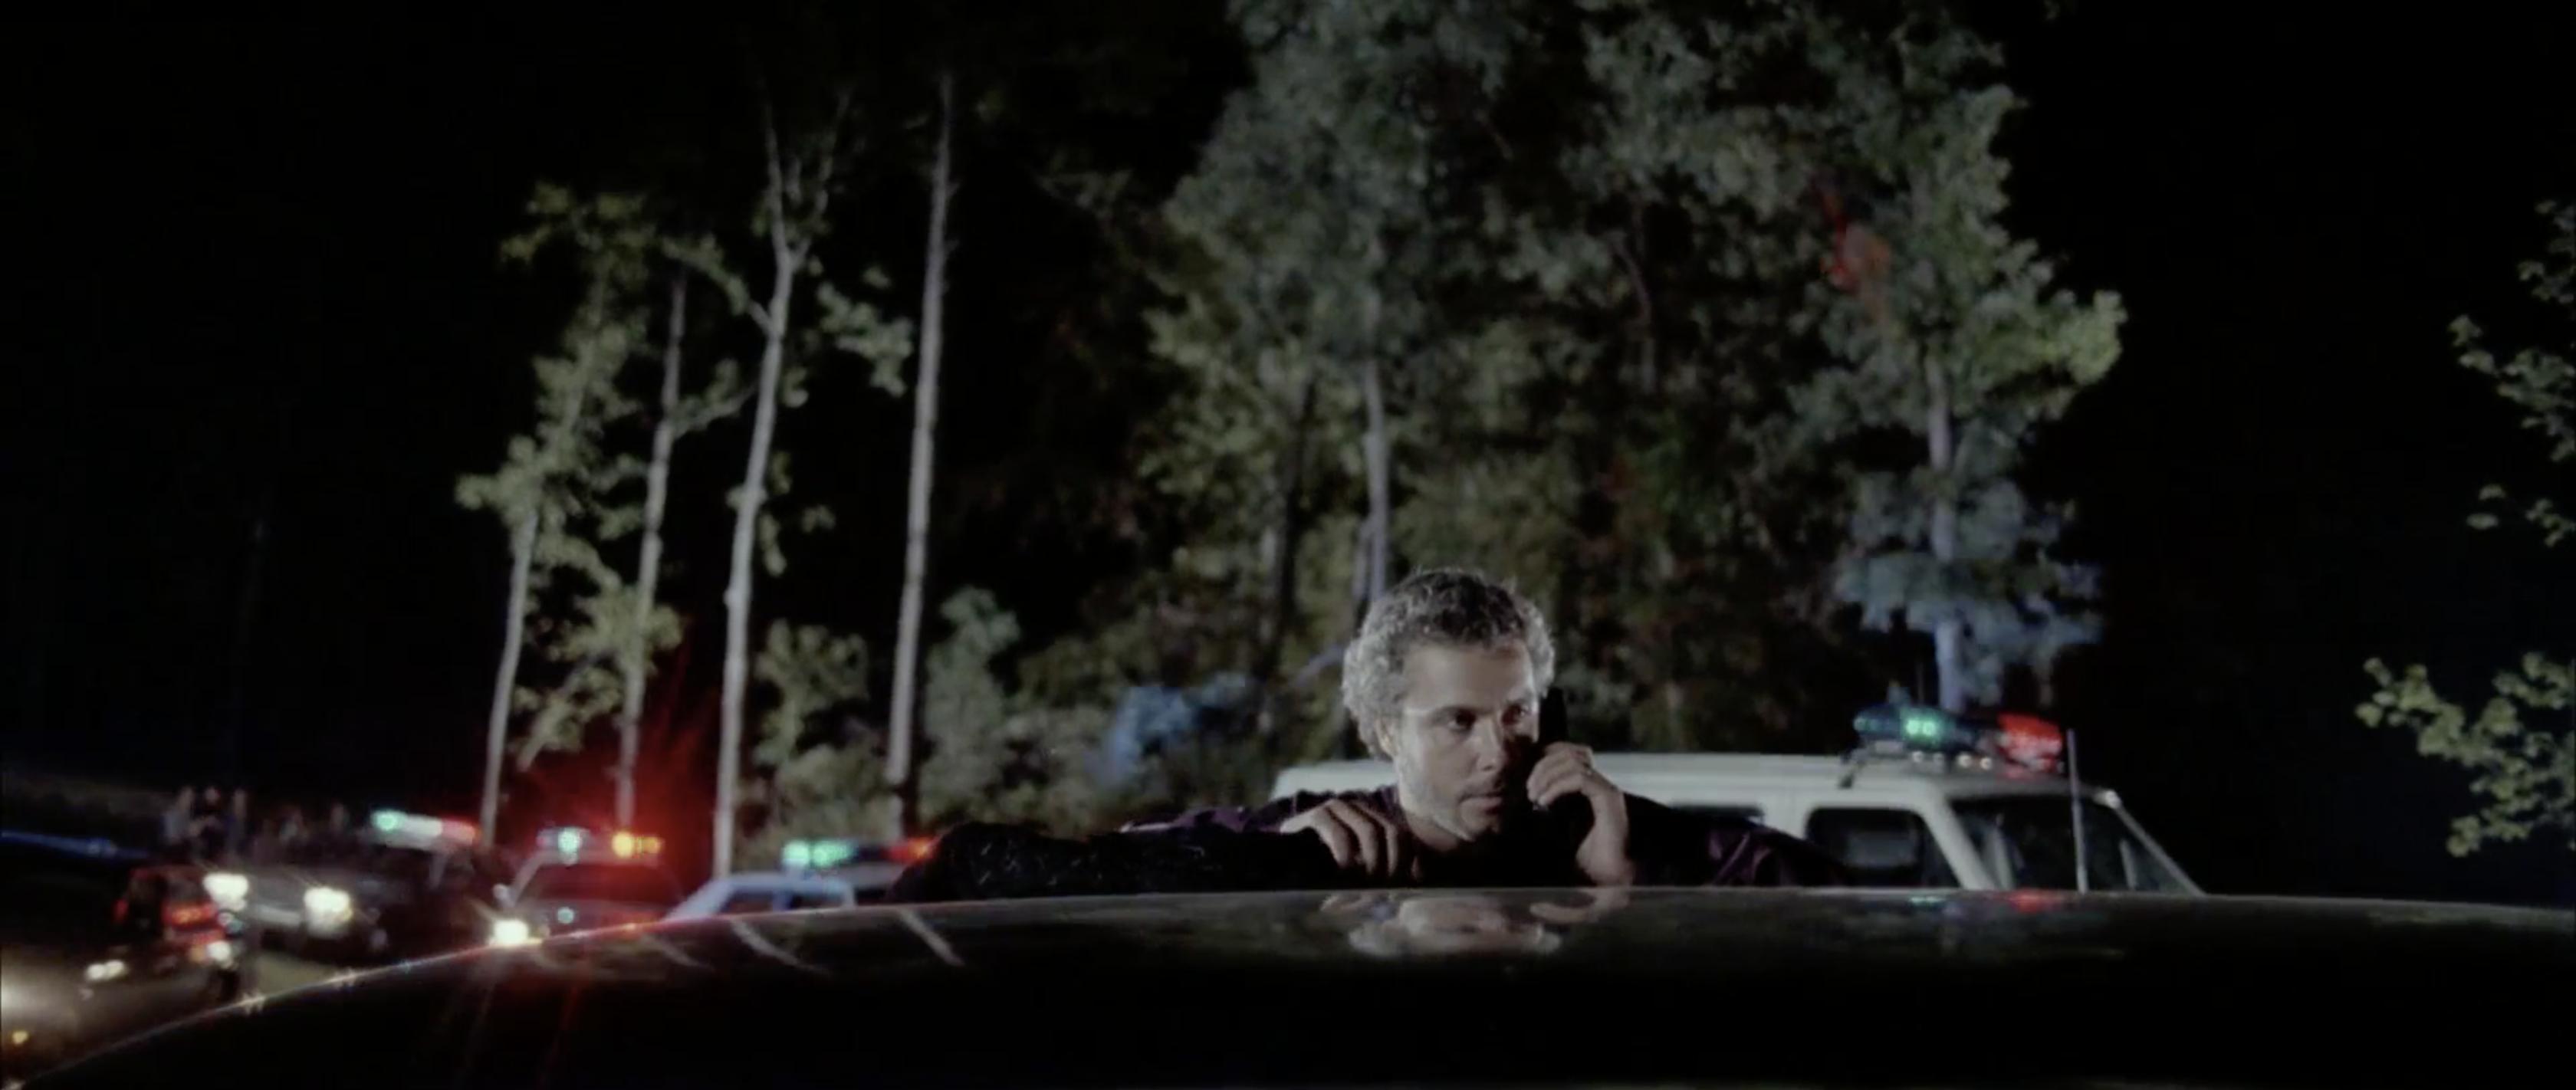 Manhunter (1986) DP: Dante Spinotti | Slasher film, Film fan ...